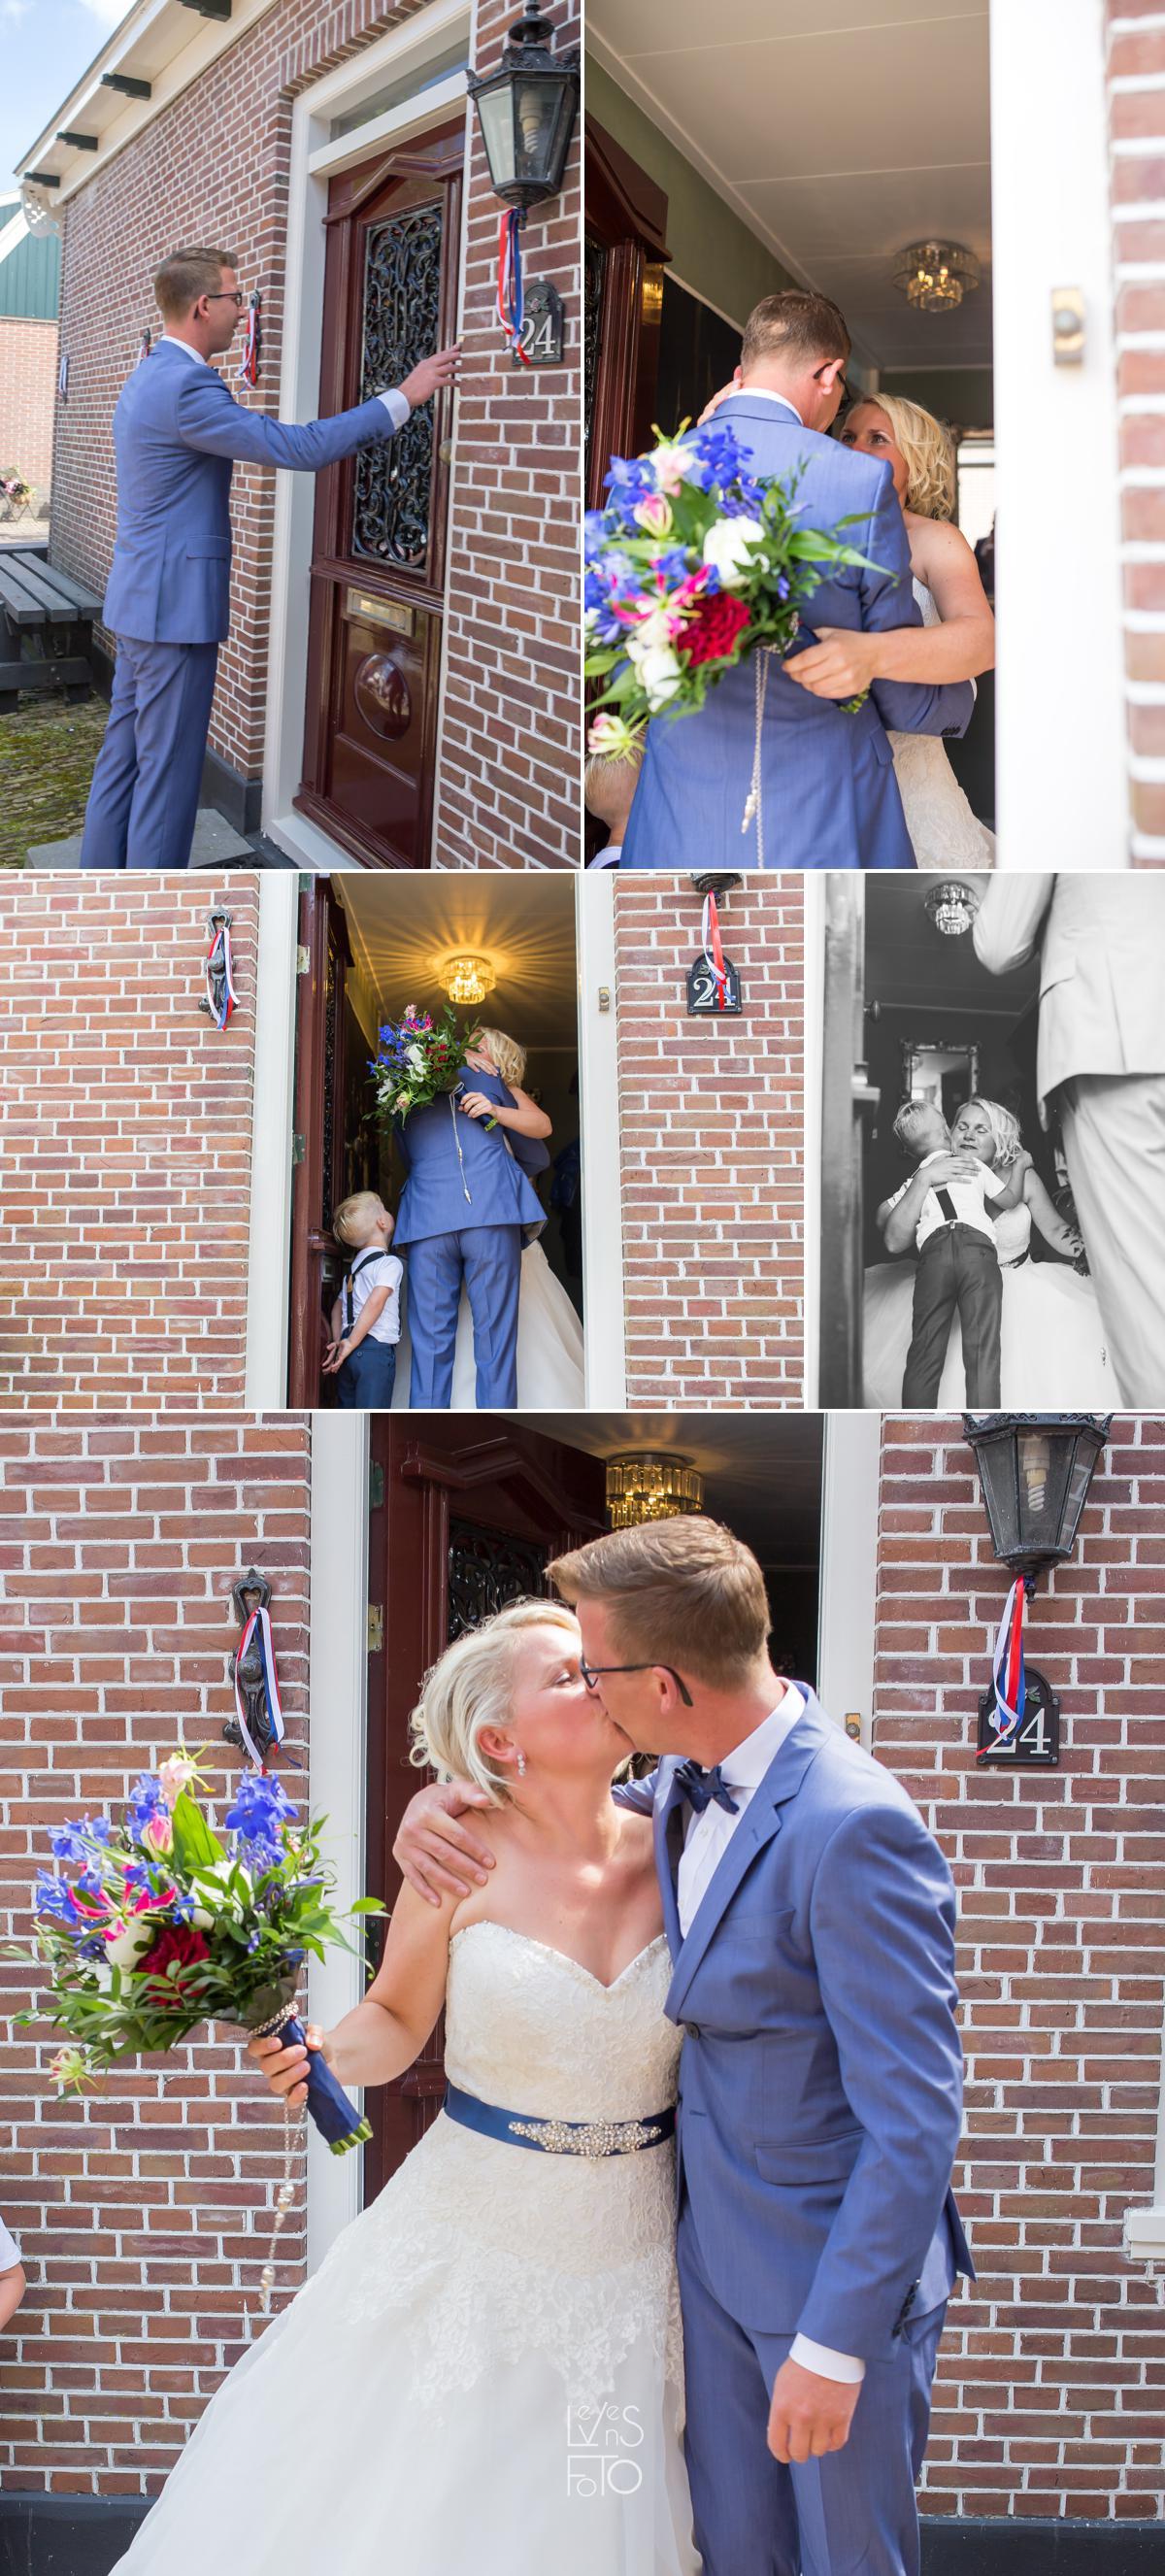 LevensFoto - huwelijk Edwin en Debby 1